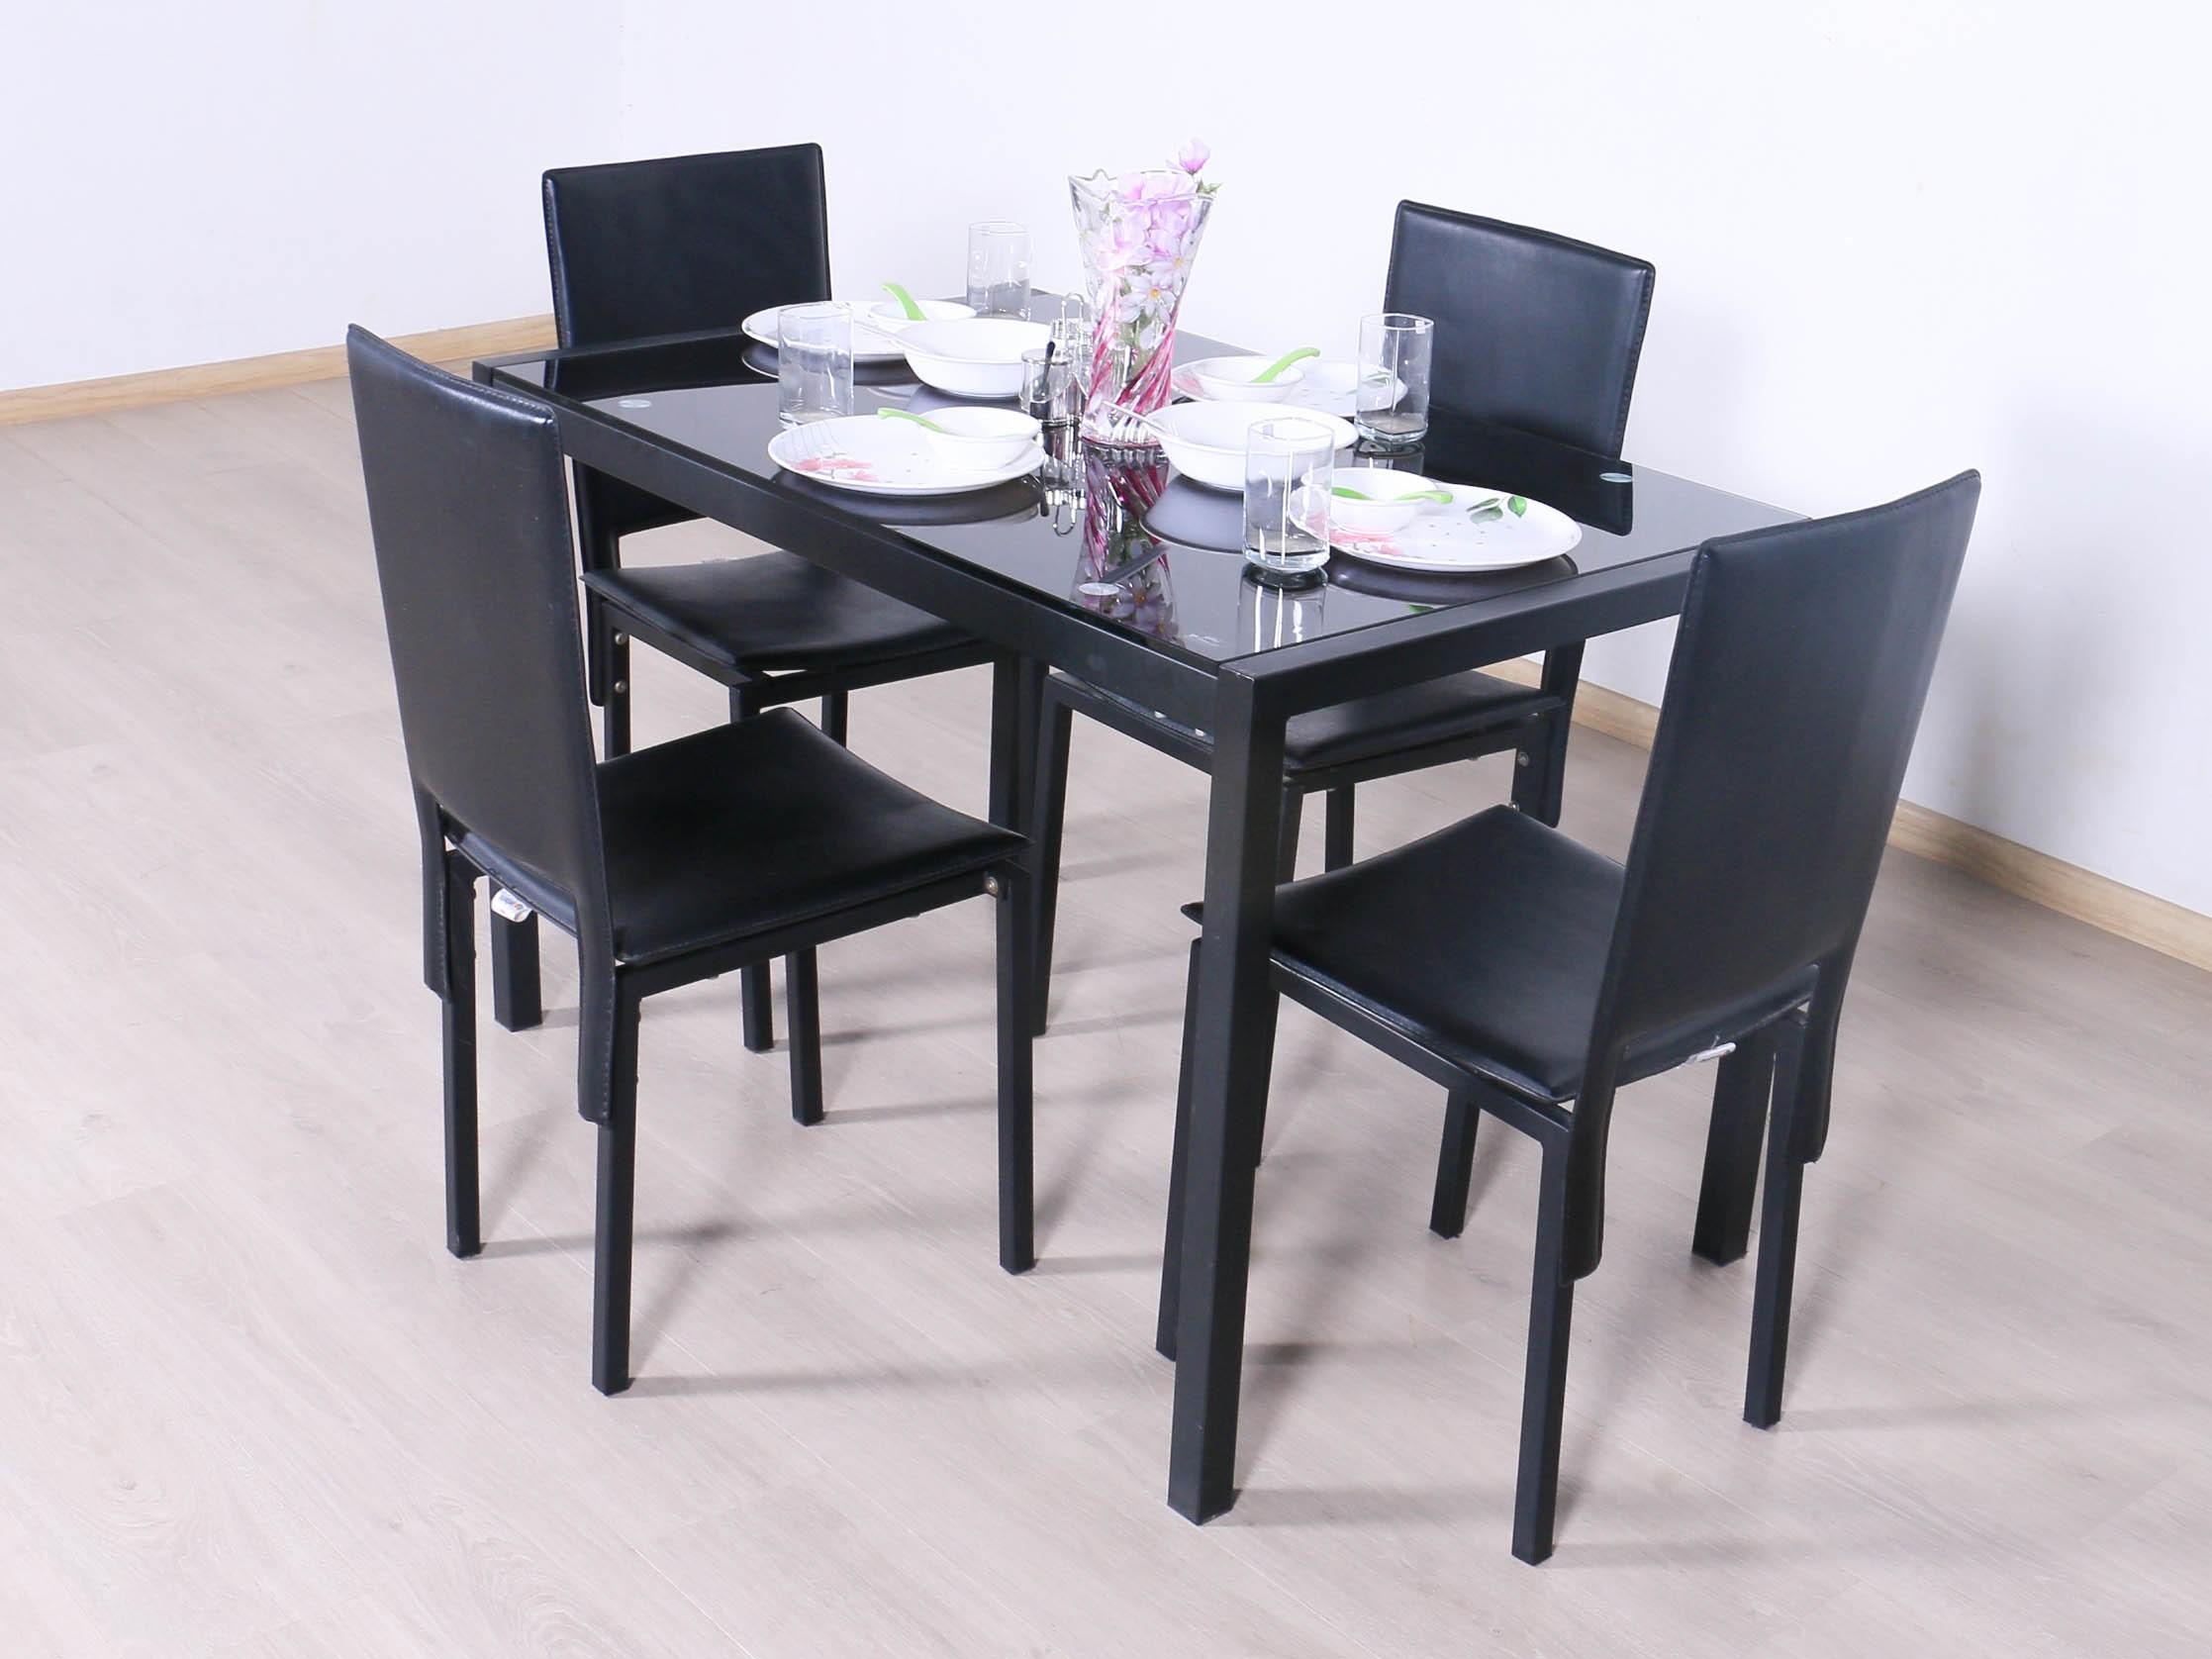 متجر الجنة تذمر 4 Seater Dining Table Olx Loudounhorseassociation Org